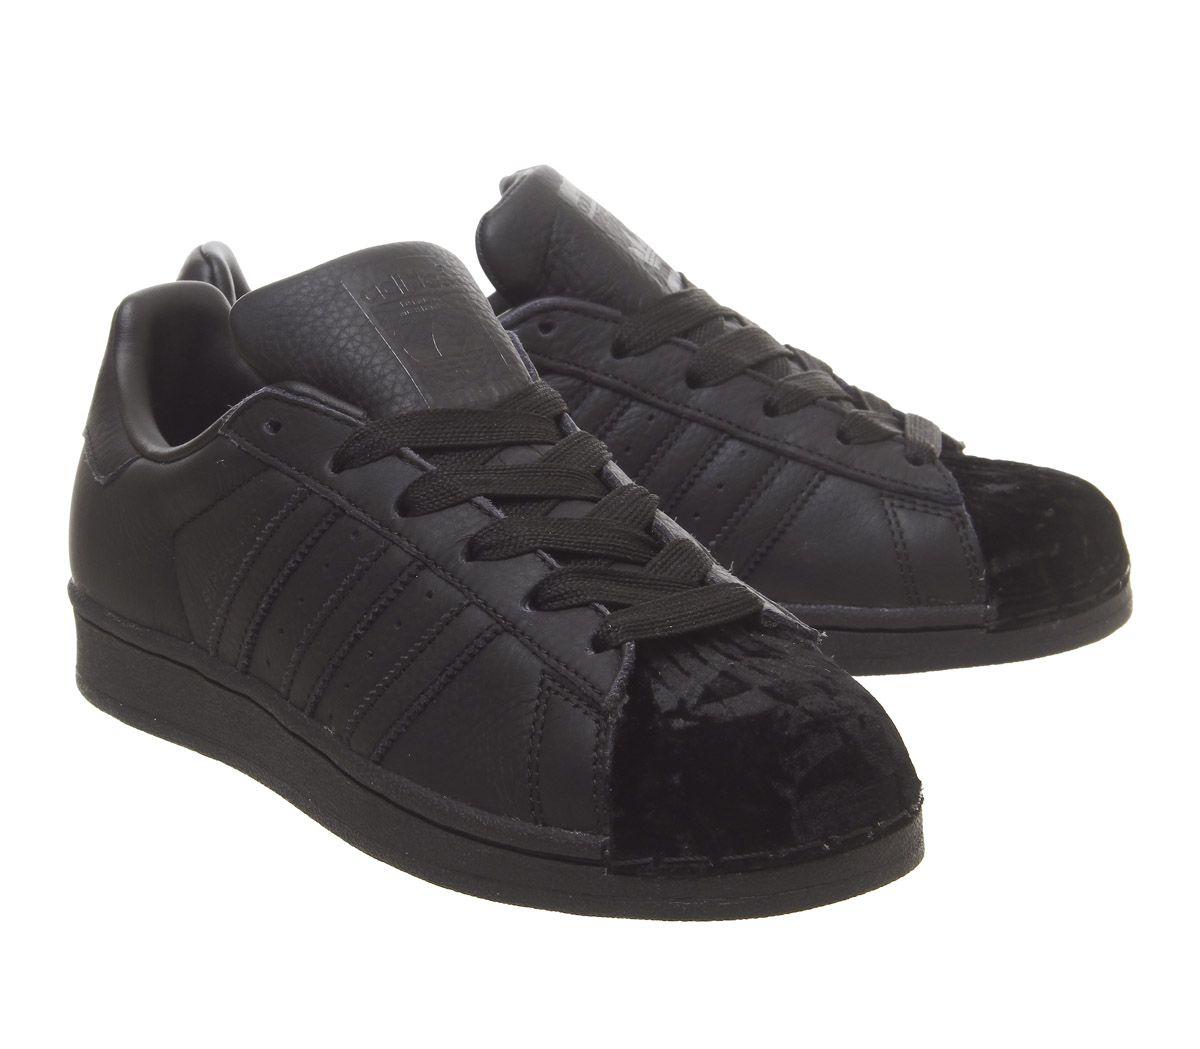 adidas superstar high top all black